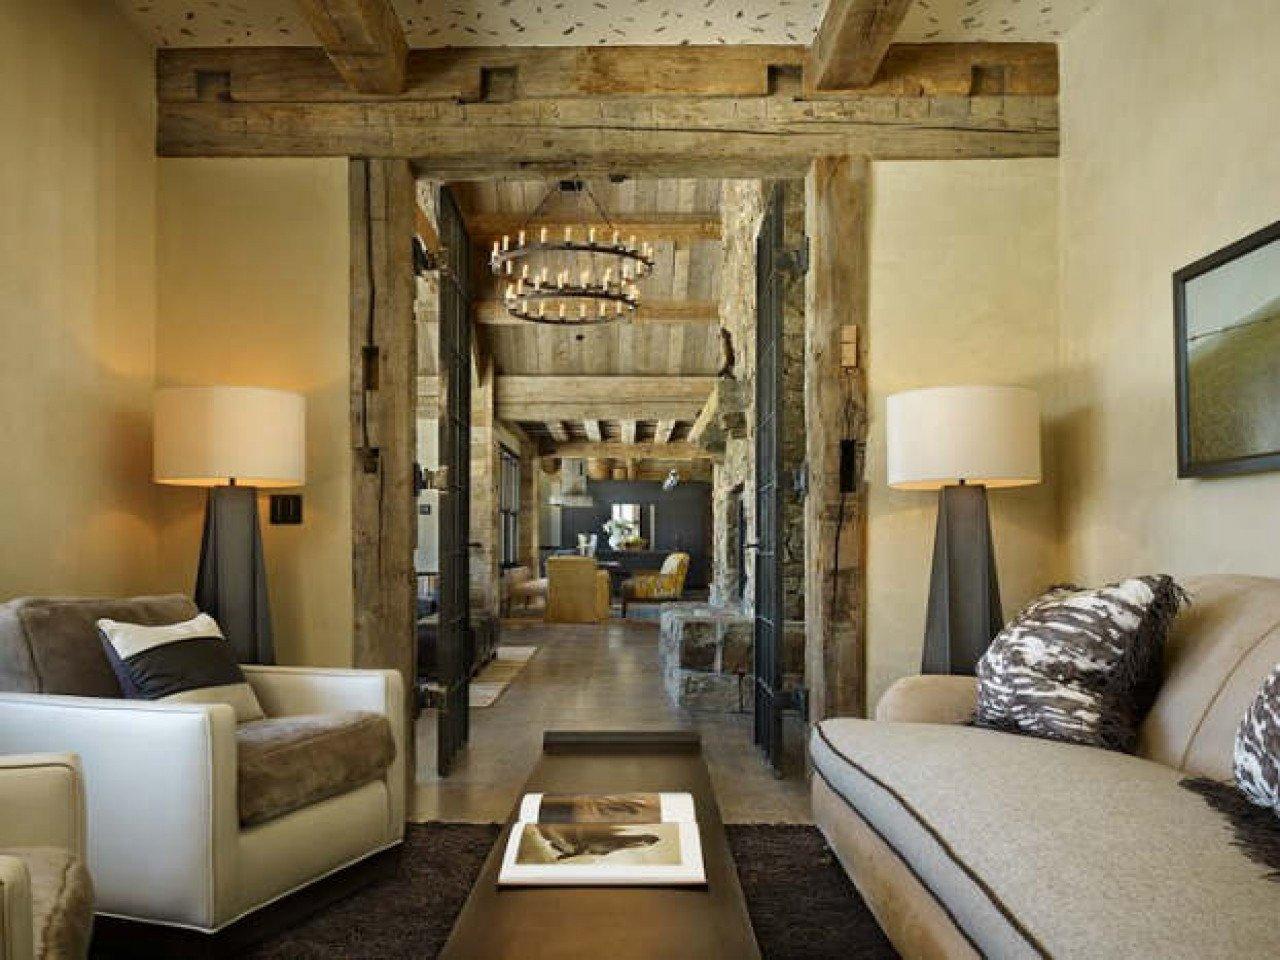 Comfortable Rustic Living Room Rustic Living Room Modern Rustic Living Room Design Ideas